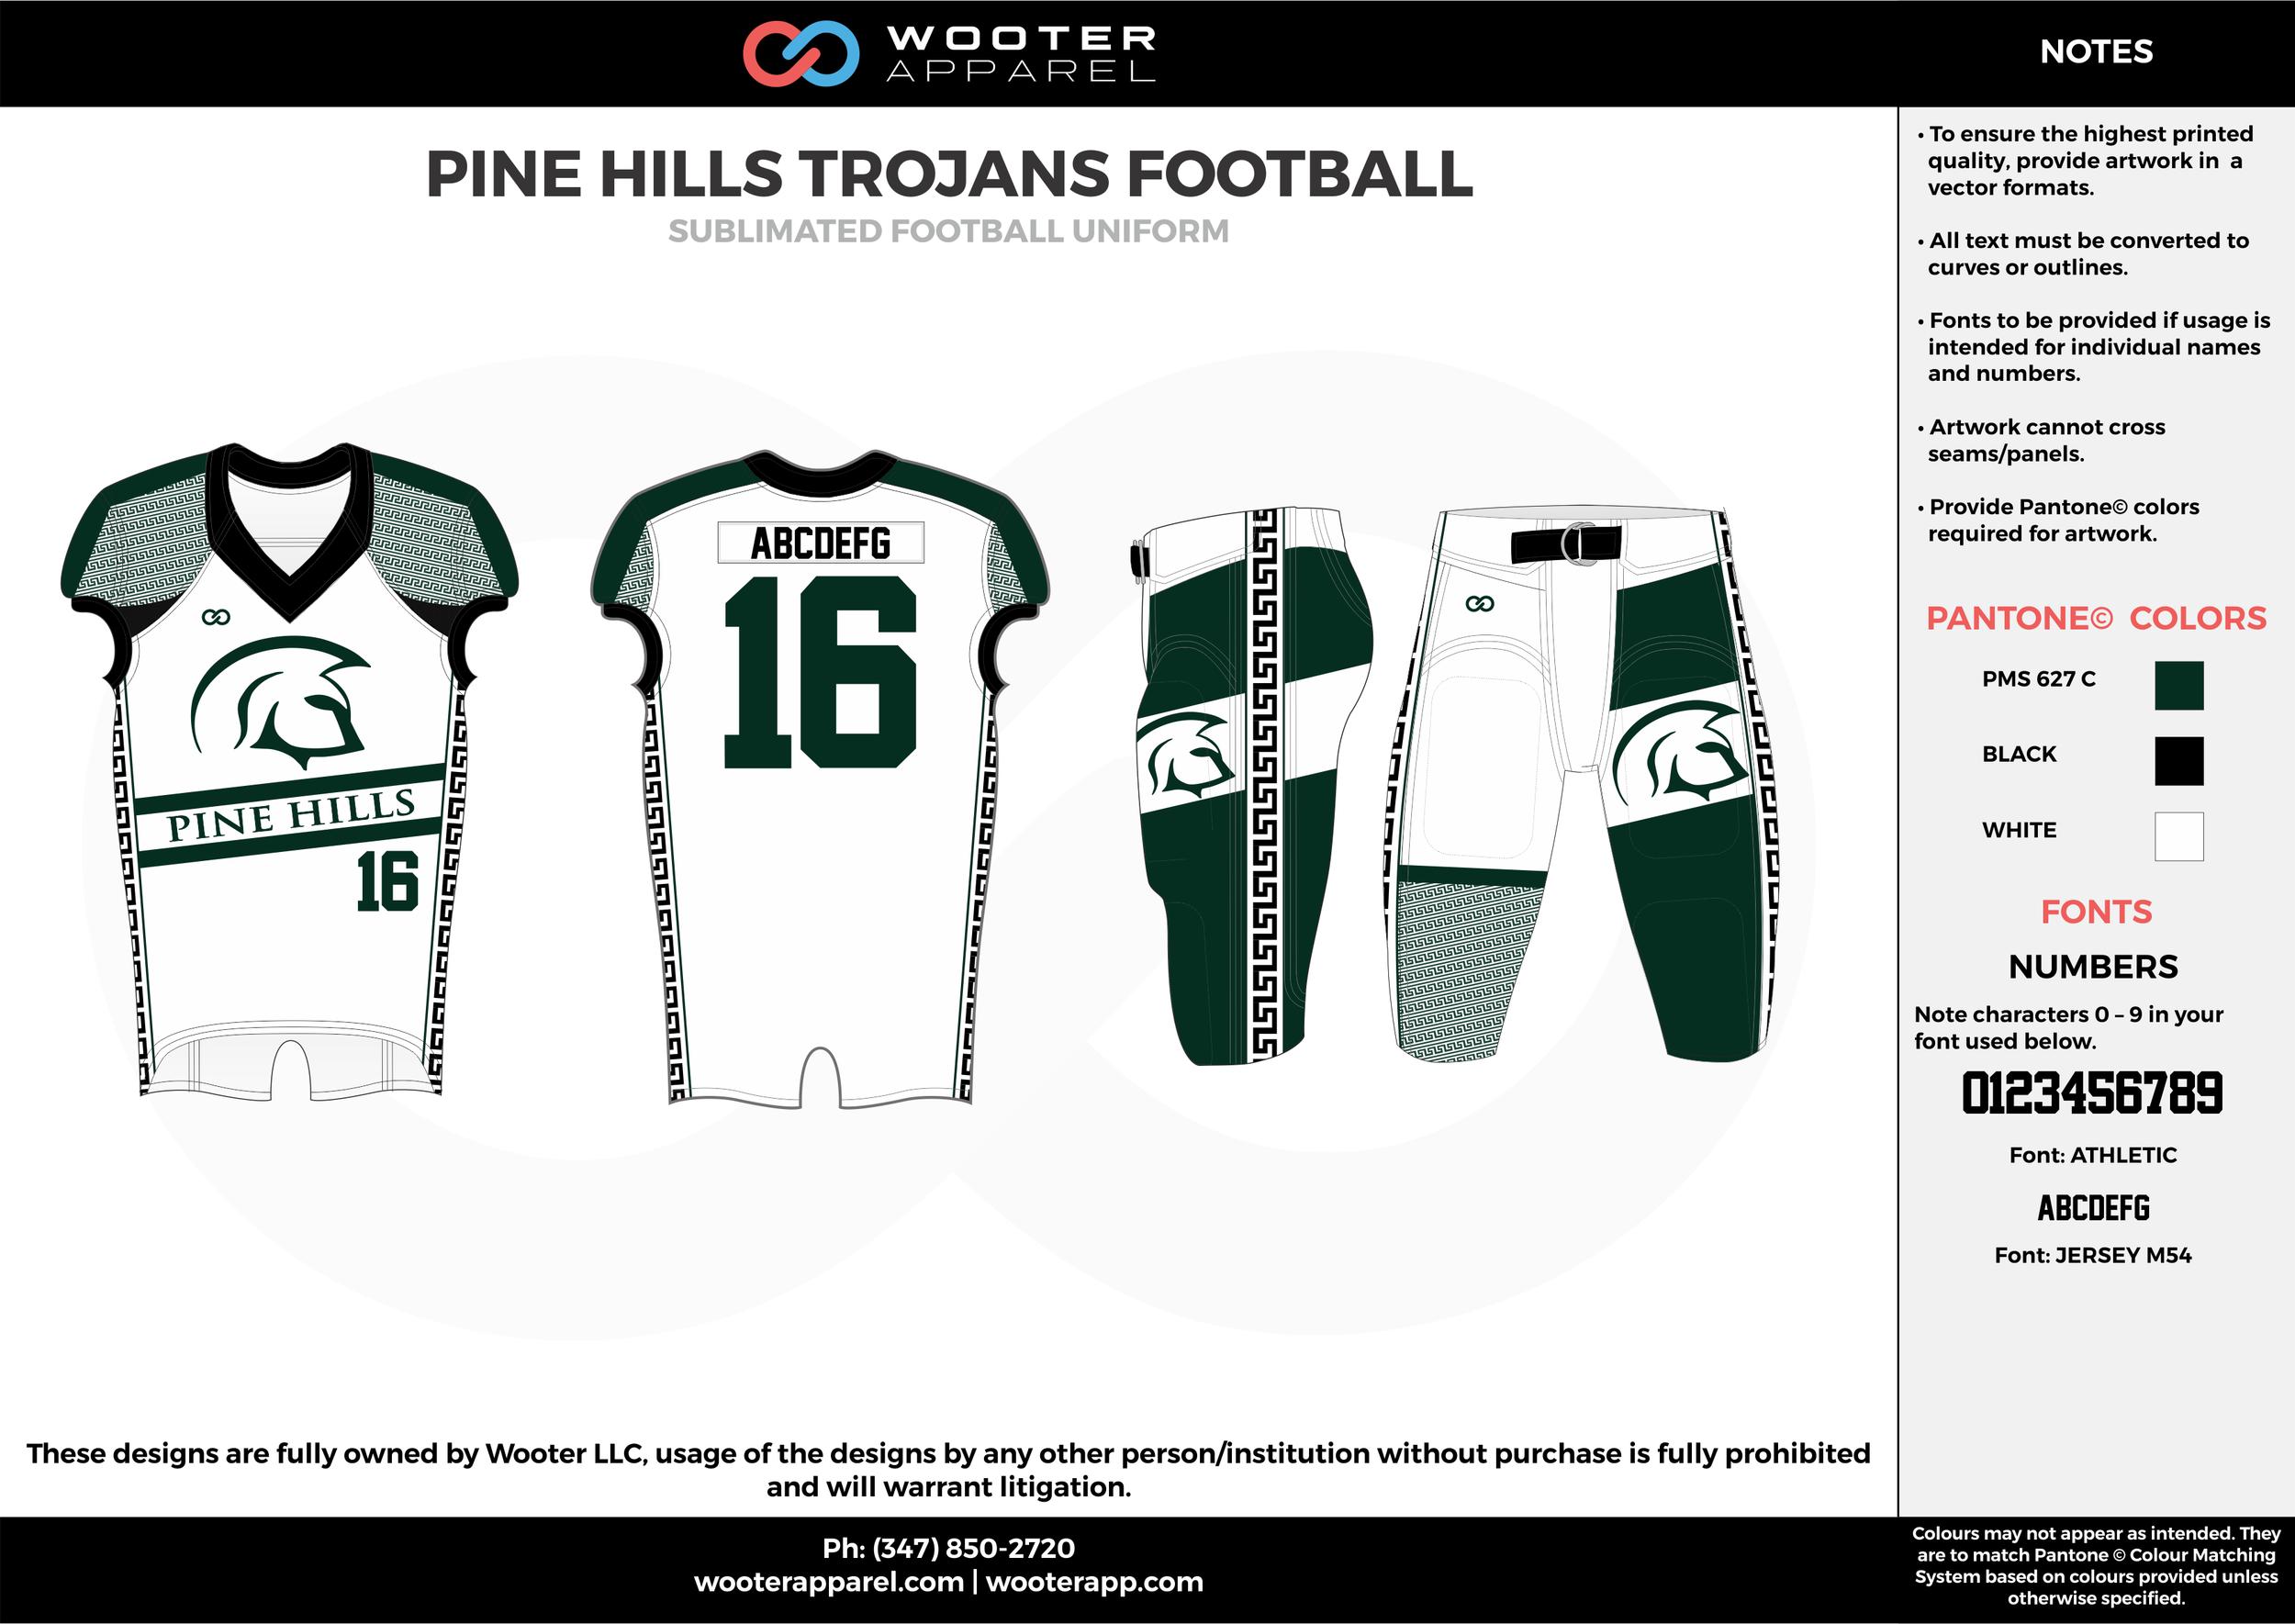 PINE HILLS TROJANS FOOTBALL green white gray football uniforms jerseys pants